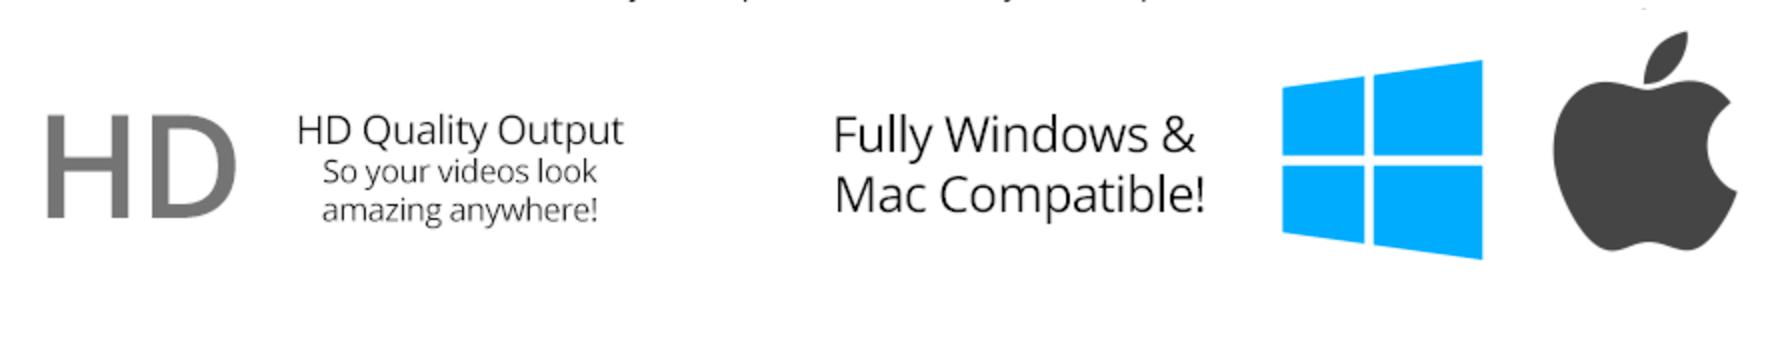 windows-mac-compatible